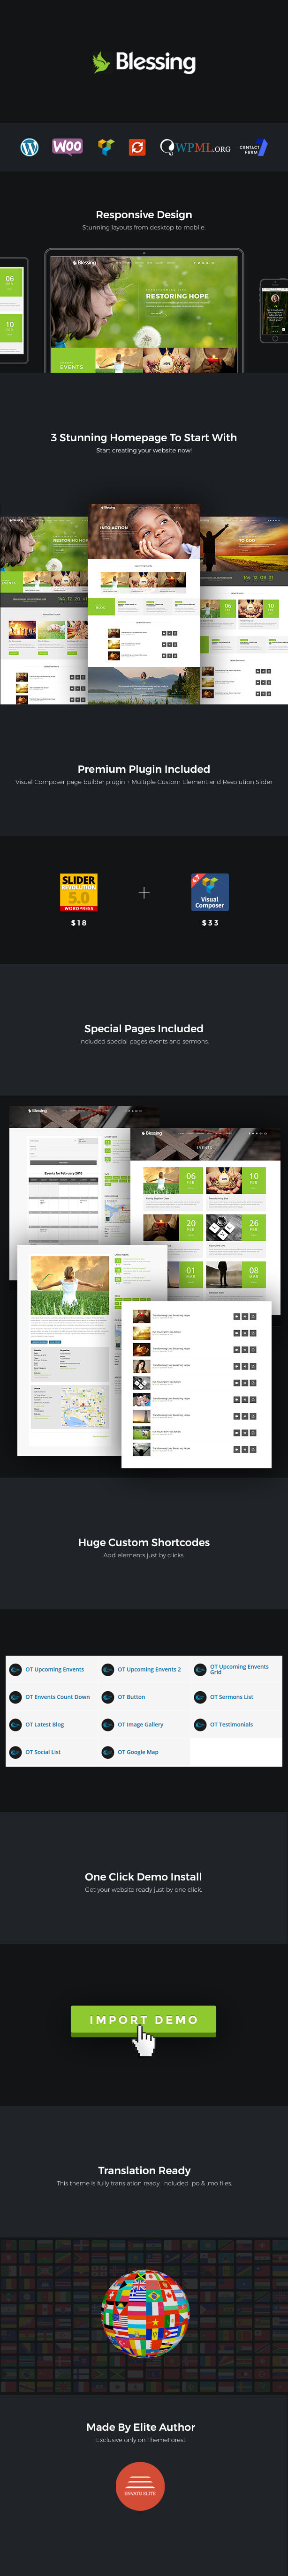 Blessing | Responsive WordPress Theme for Church Websites